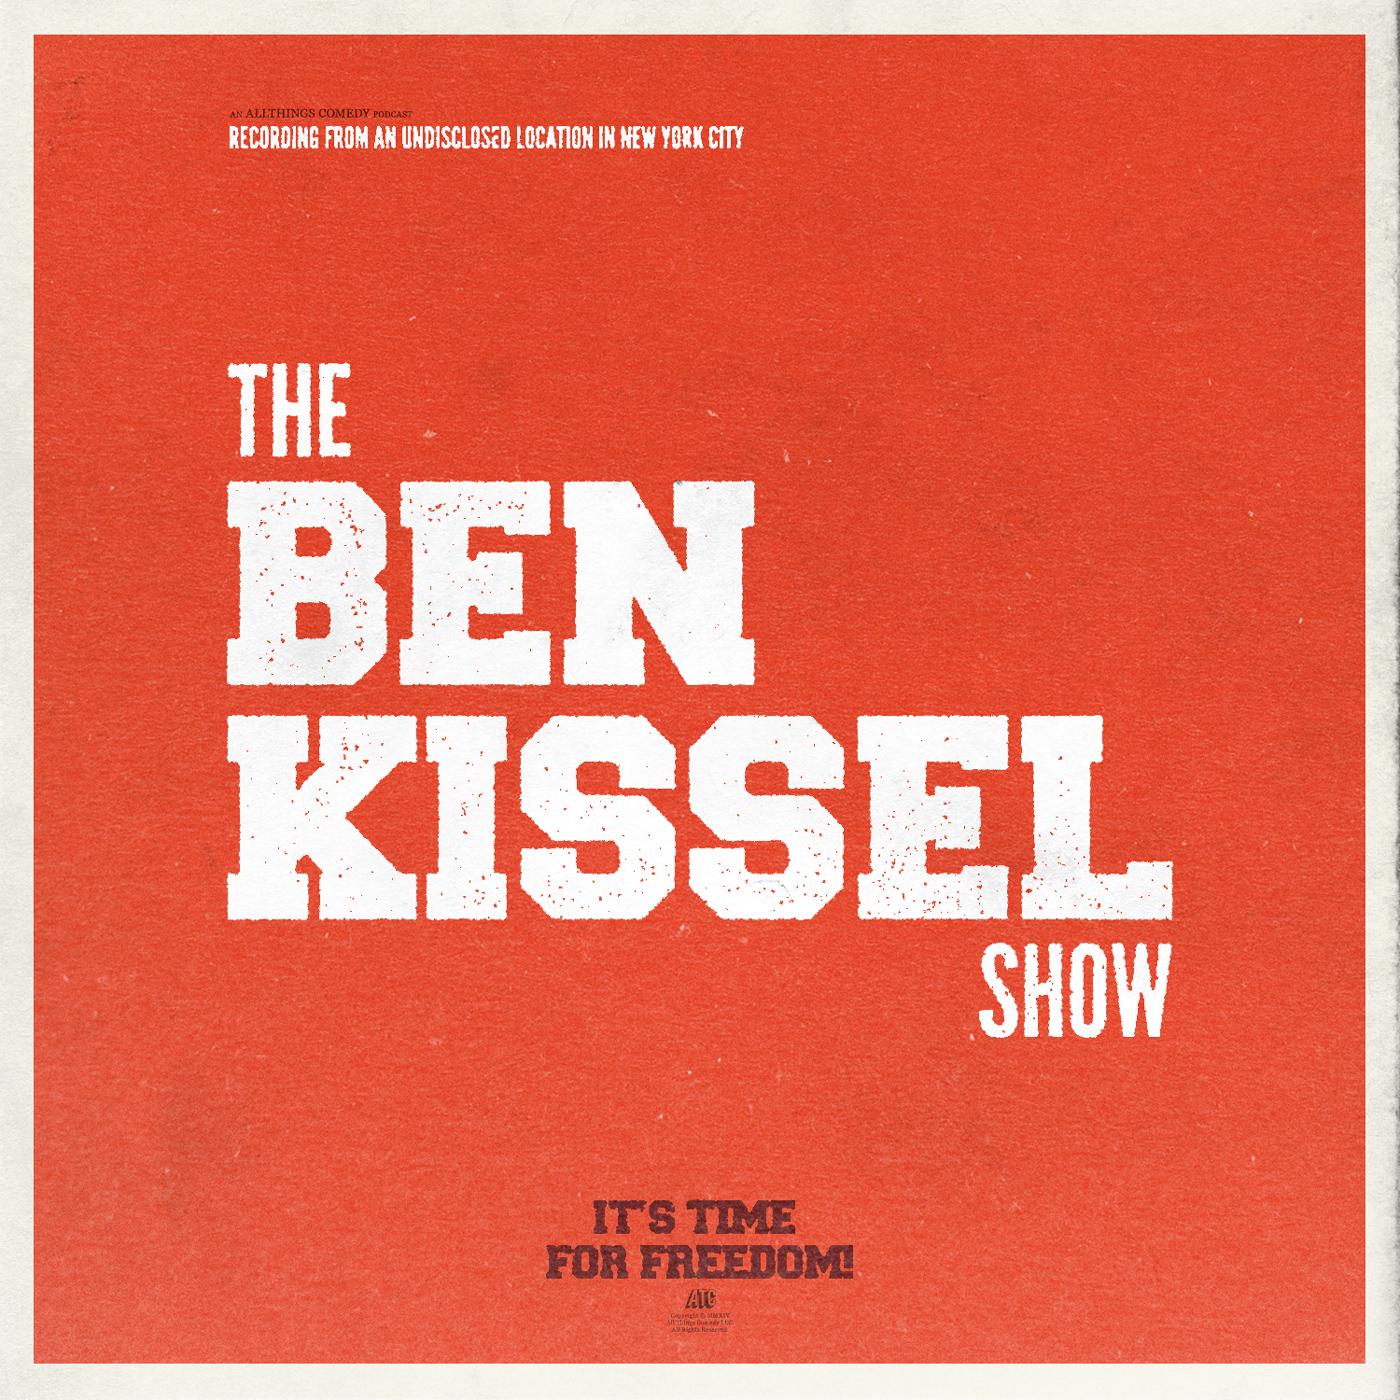 The Ben Kissel Show